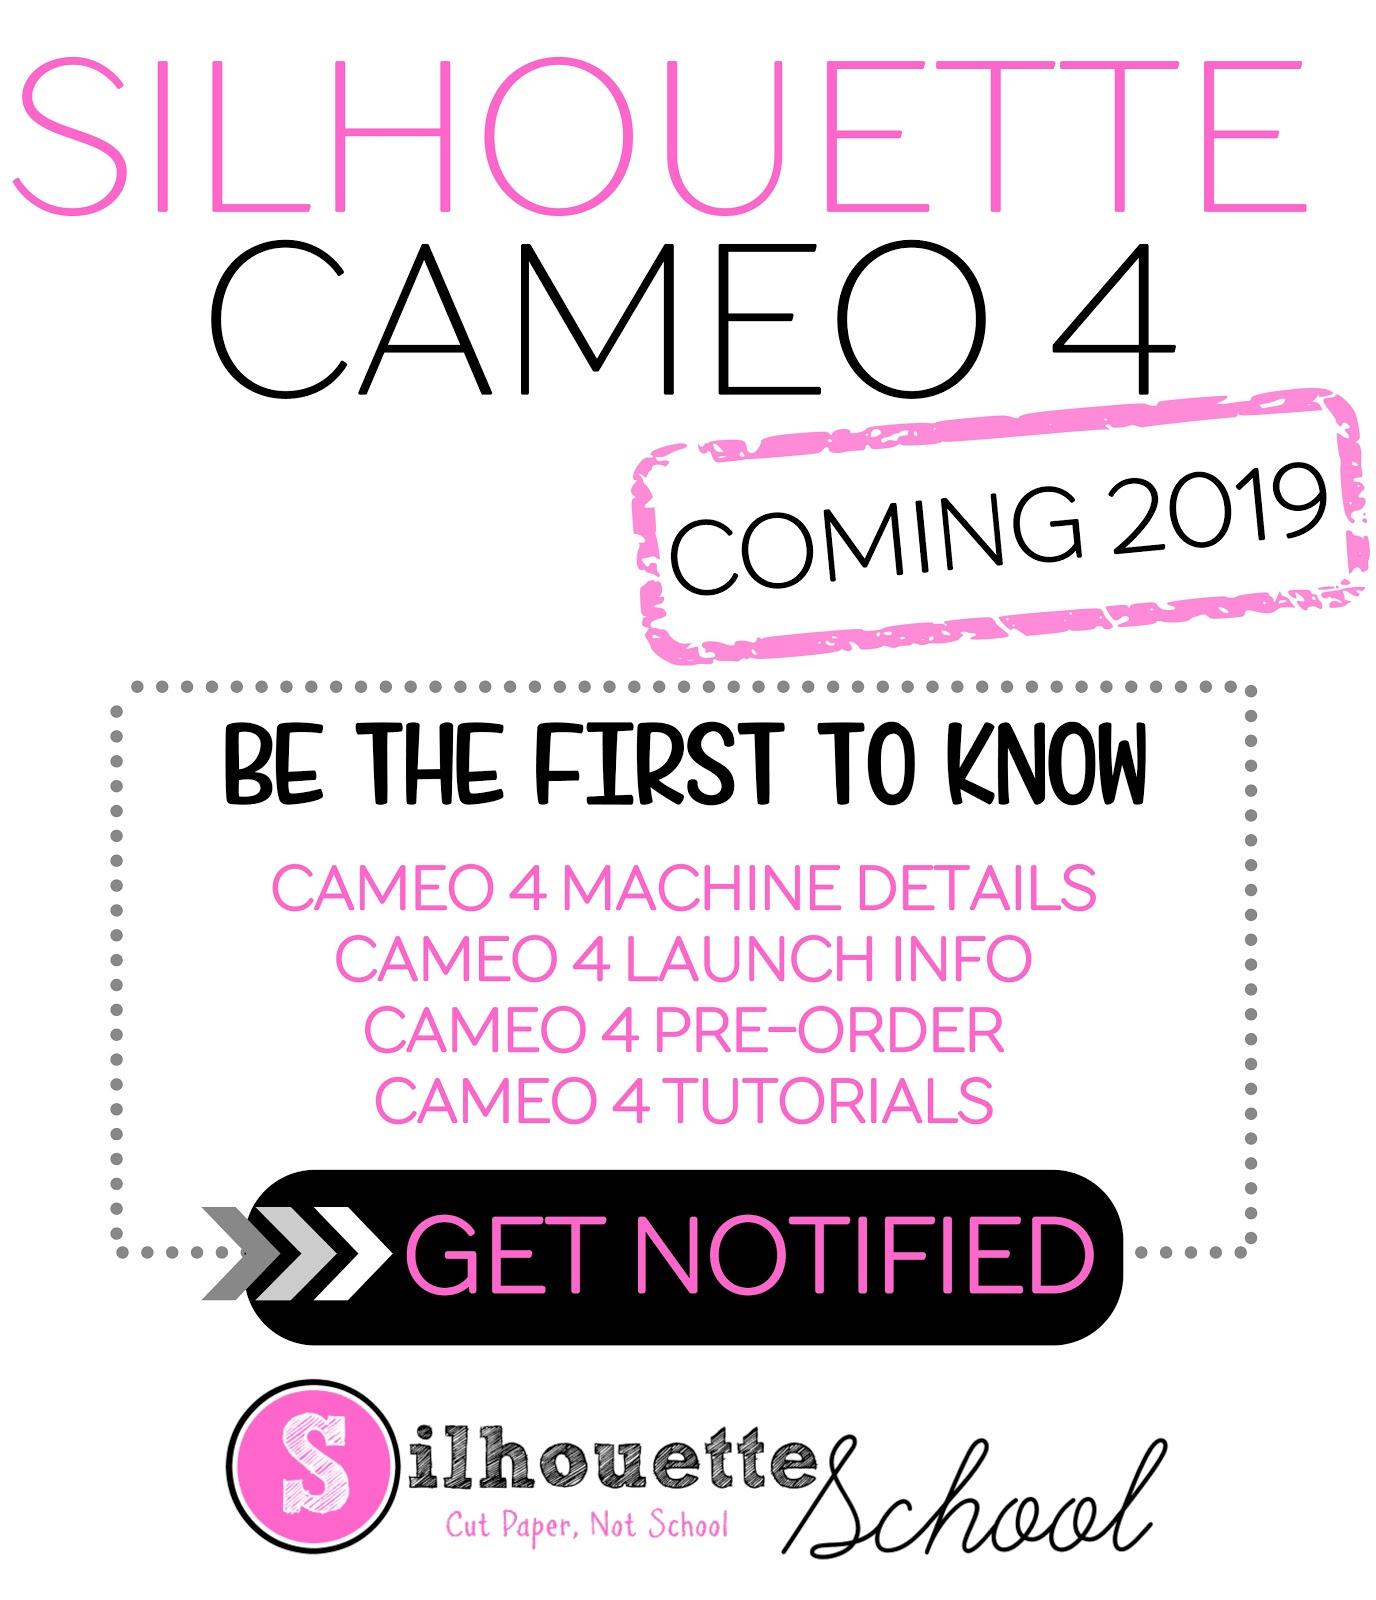 Silhouette CAMEO 4, Silhouette CAMEO 4 release date, New Silhouette CAMEO, Silhouette CAMEO 4 features, Pre Order Silhouette CAMEO 4, Pre Order CAMEO 4, Silhouette CAMEO 3 vs CAMEO 4